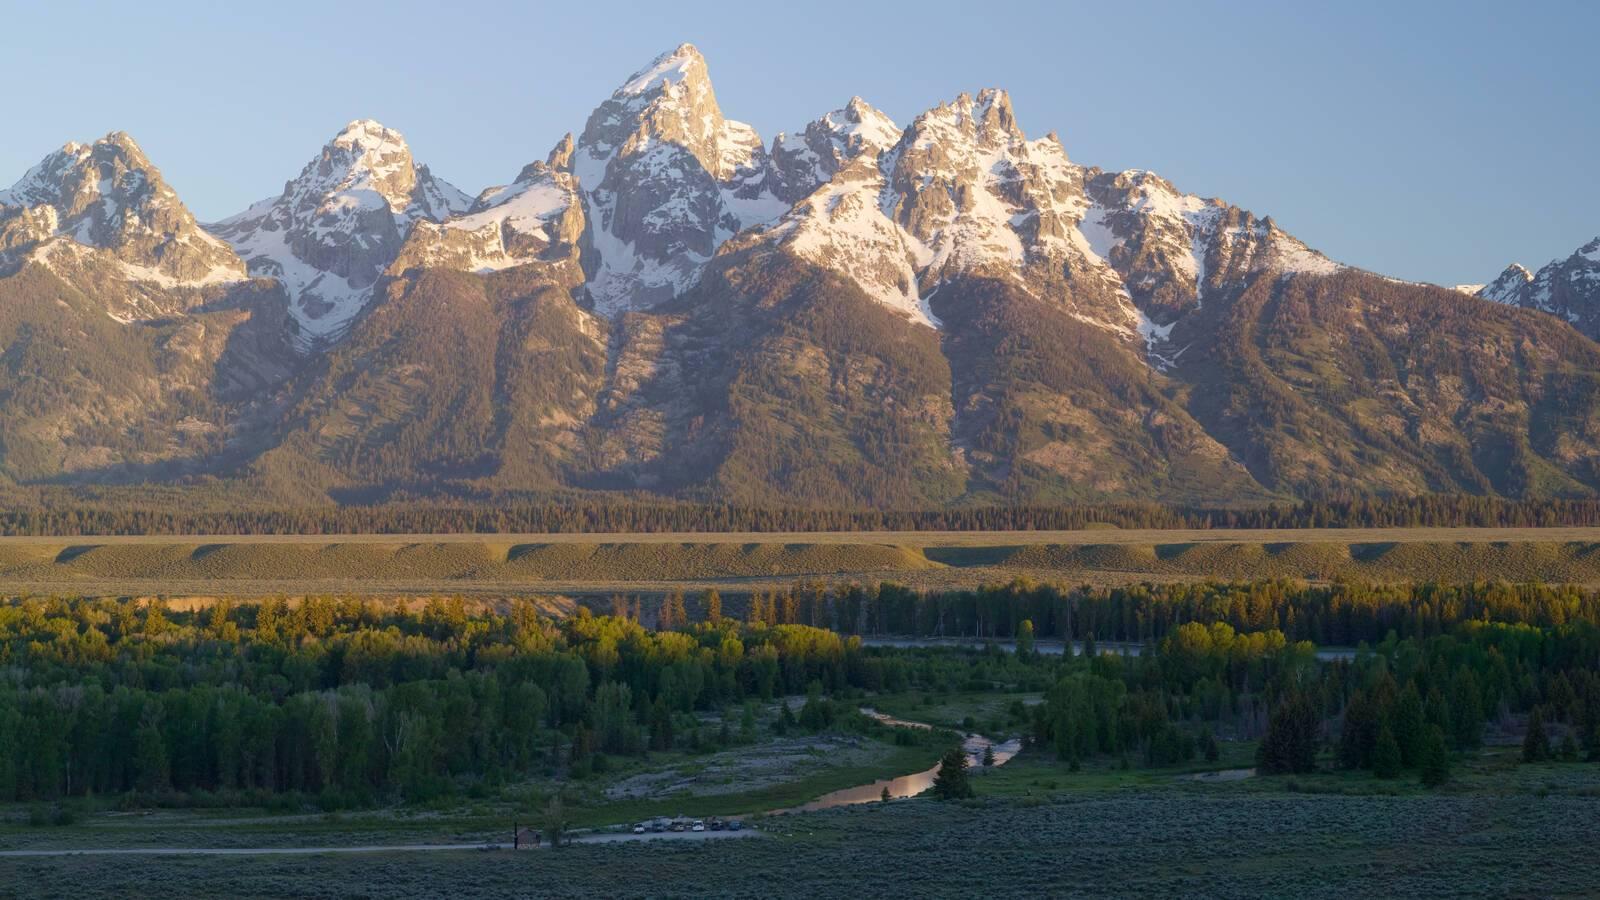 Amangani Vue Etats Unis Yellowstone